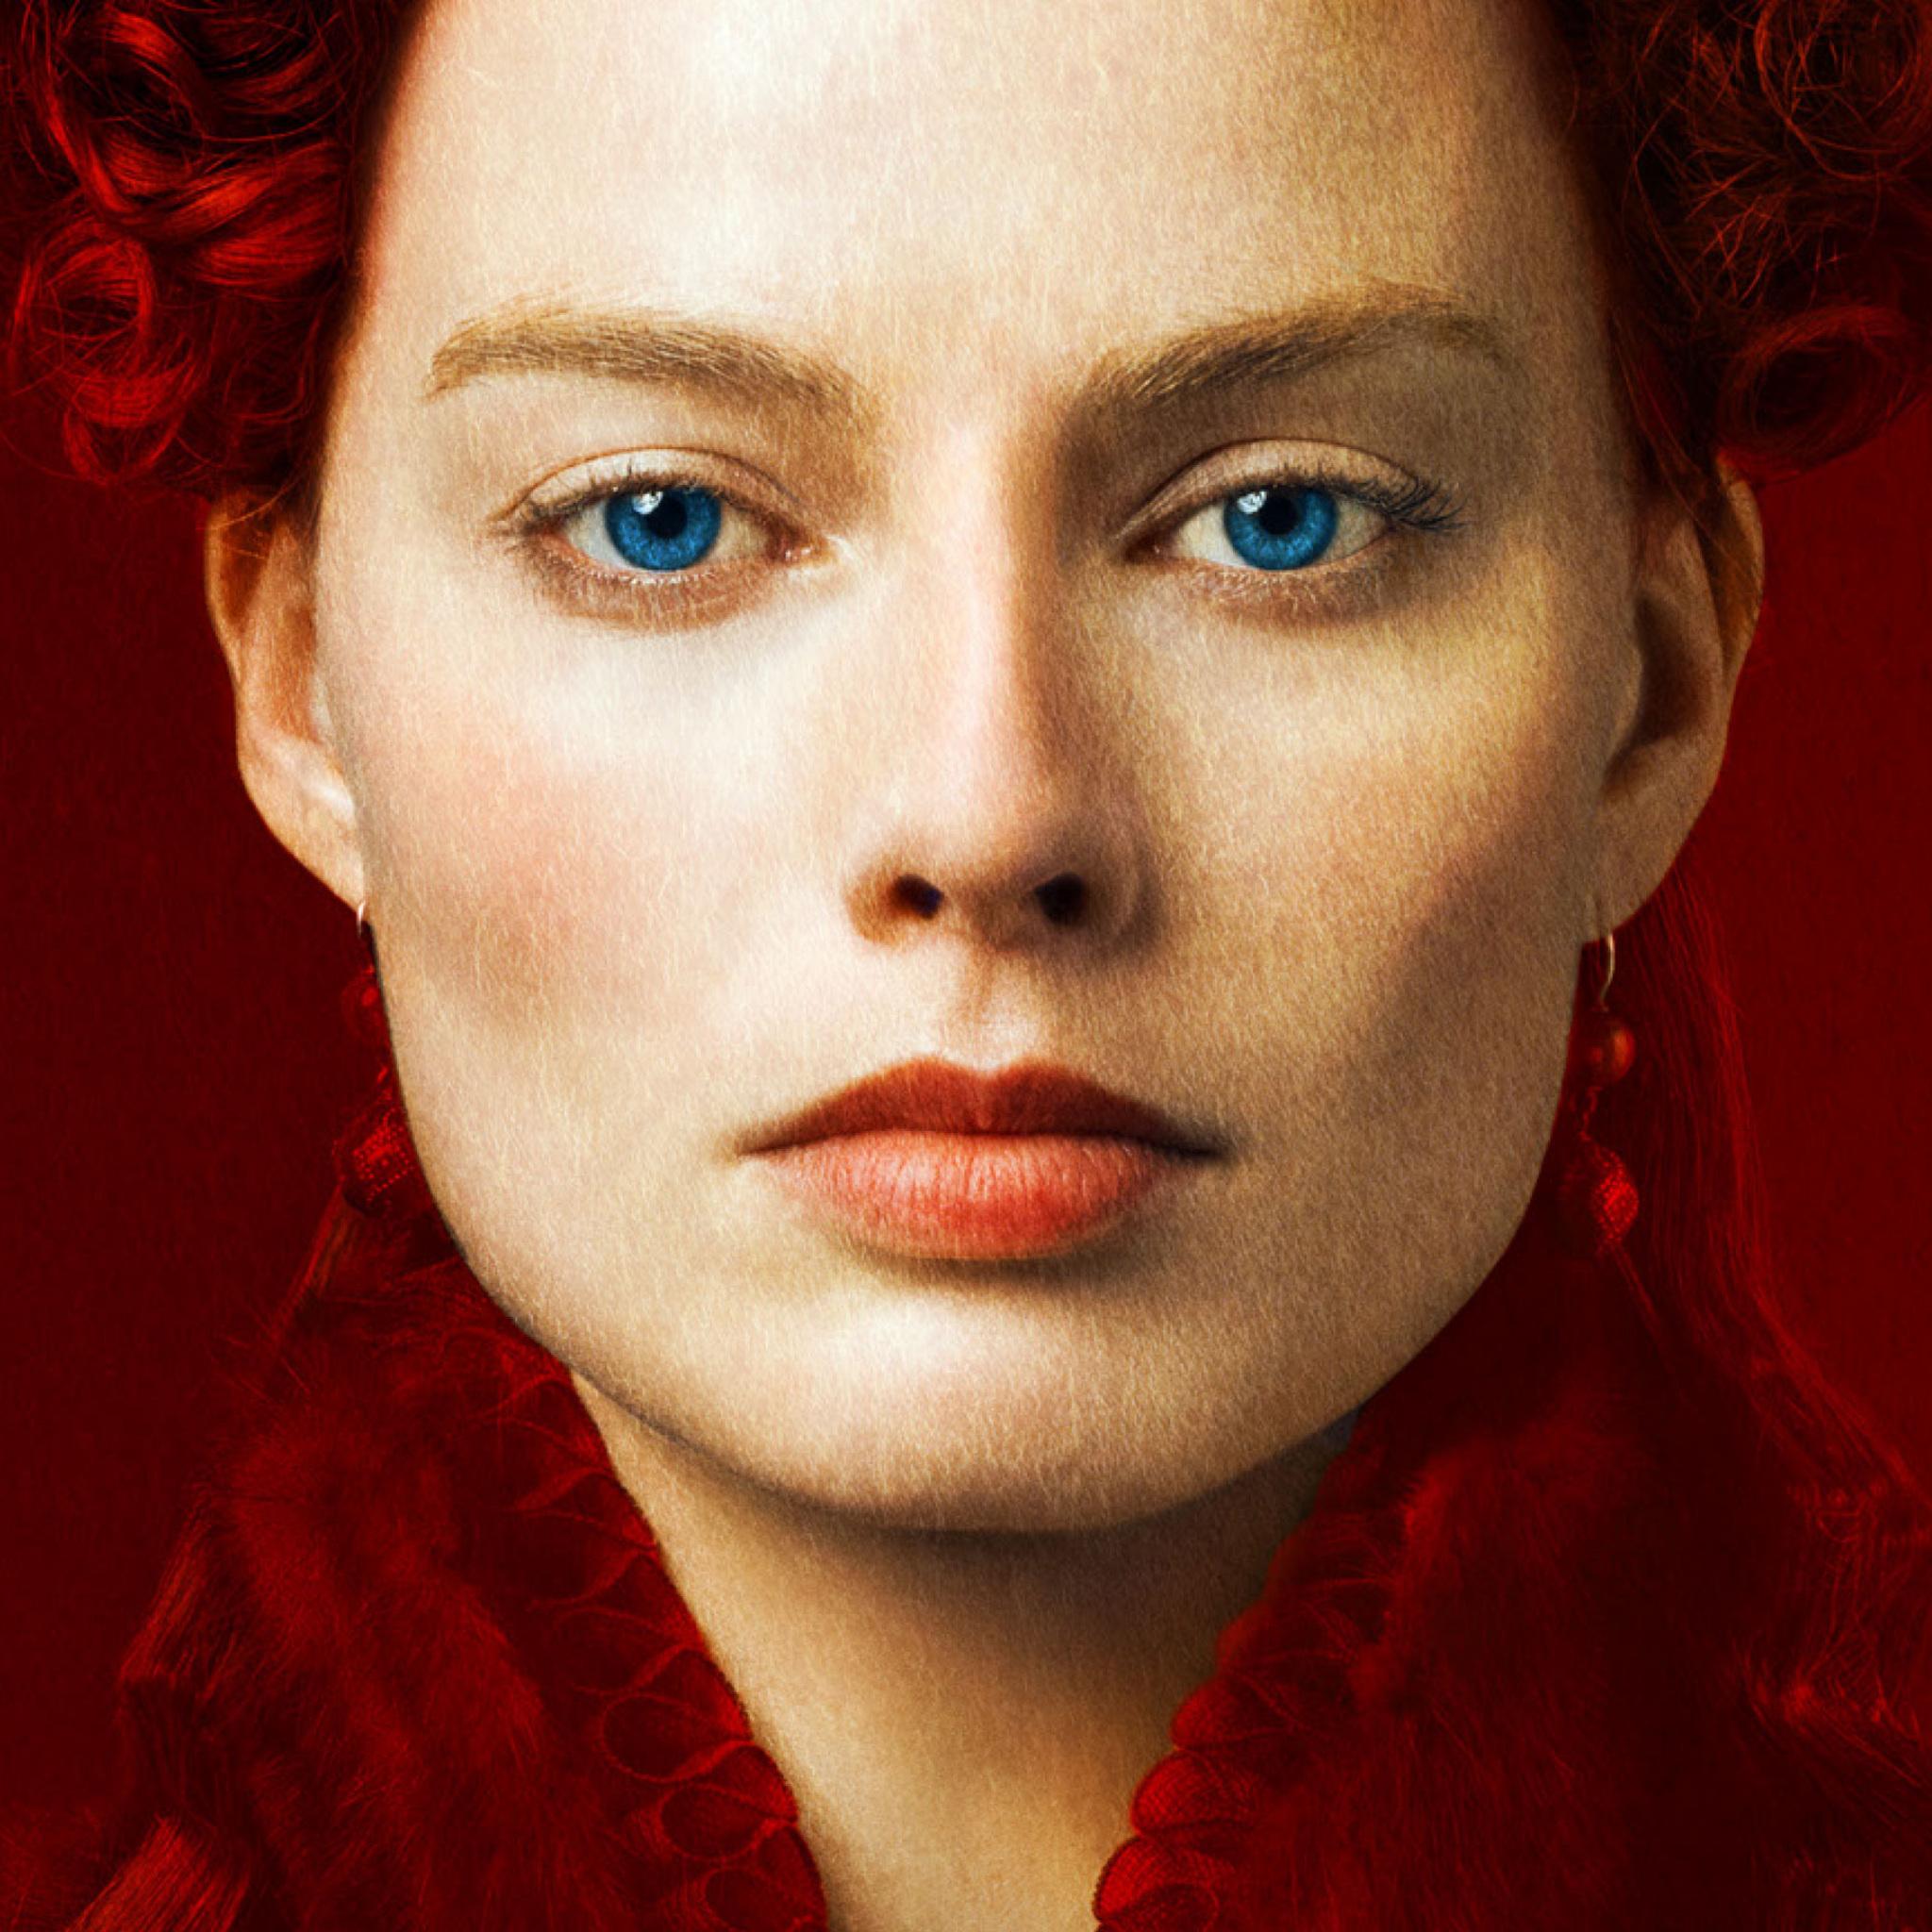 margot-robbie-as-elizabeth-in-mary-queen-of-scots-movie-oh.jpg